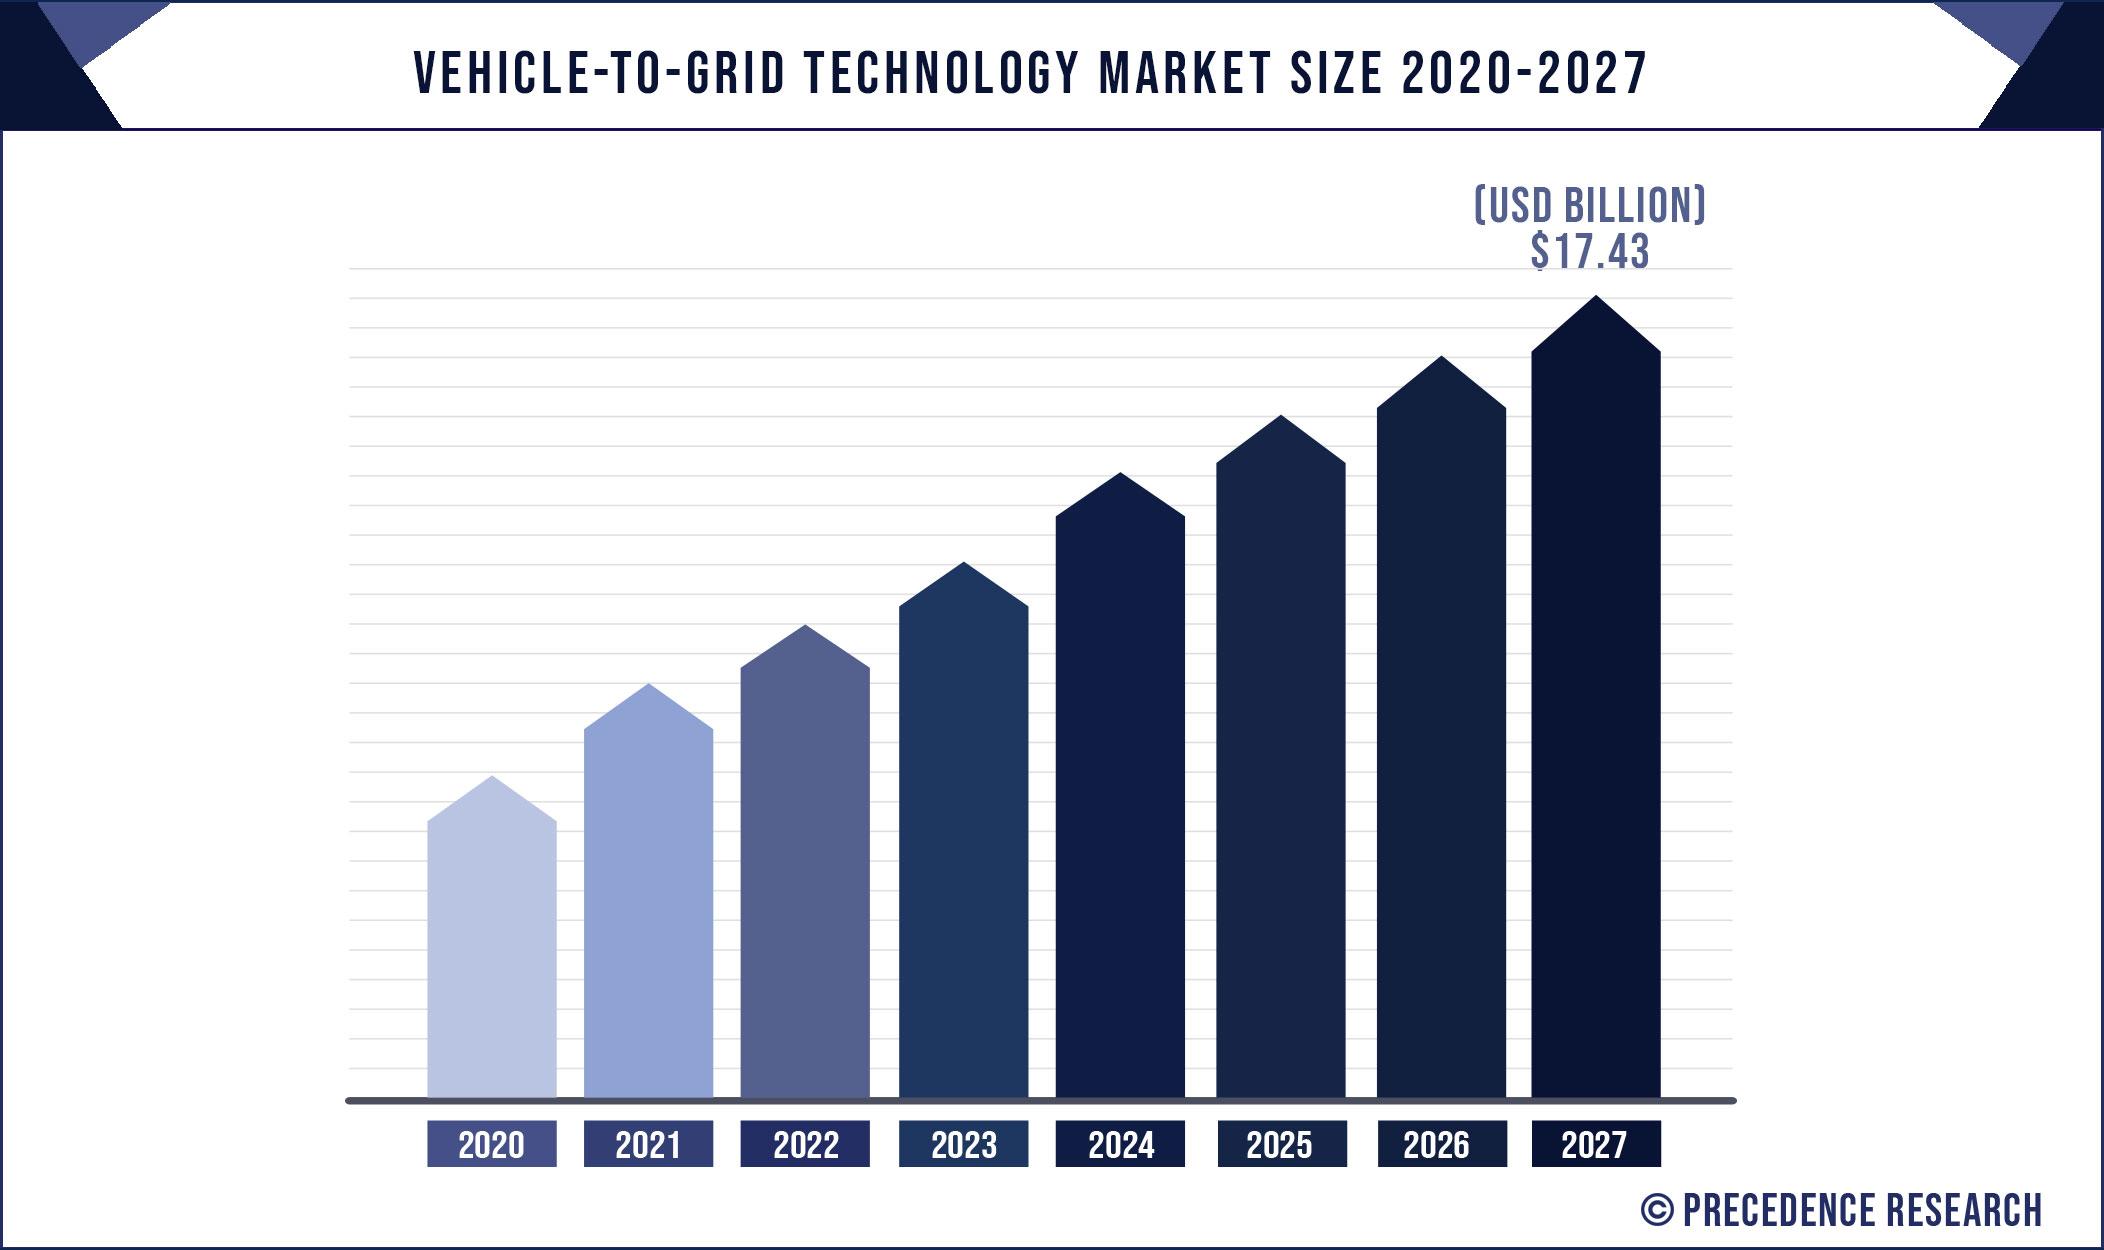 Vehicle to Grid Technology Market Size 2020-2027